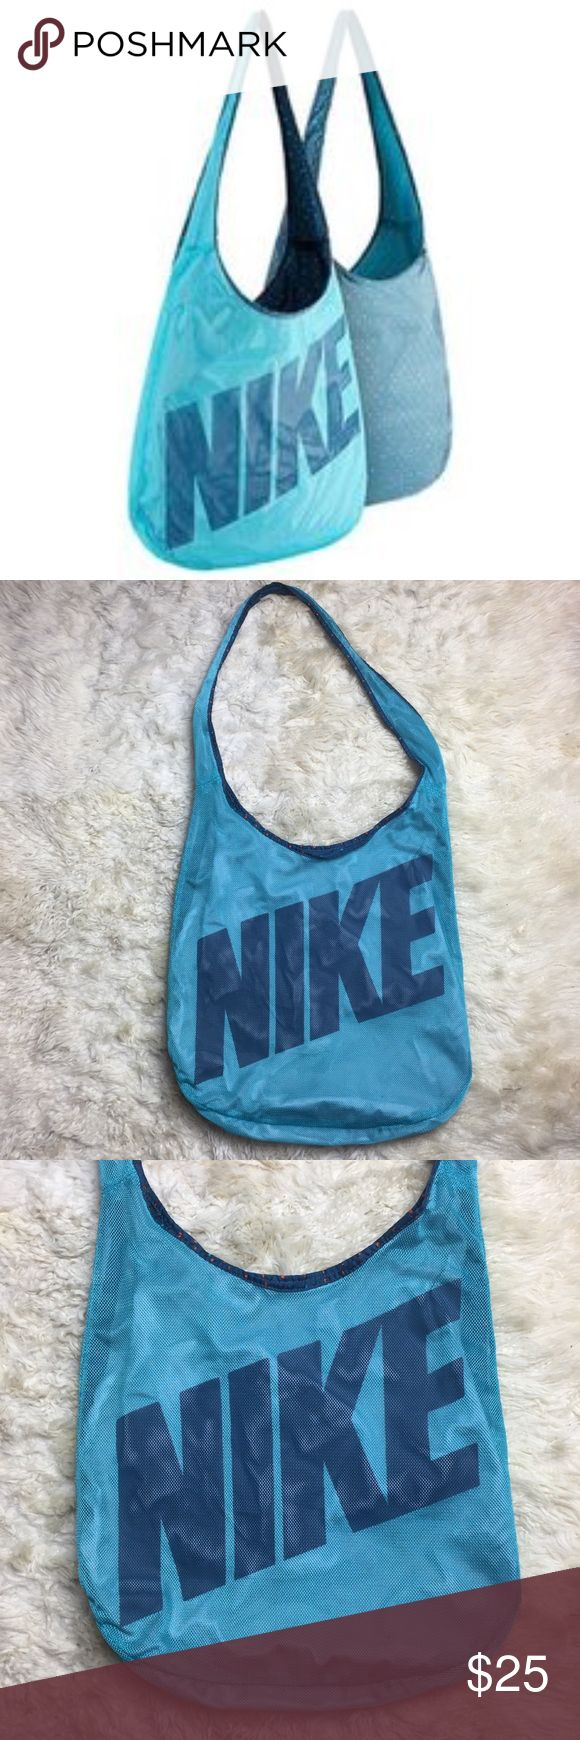 "NIKE REVERSIBLE SHOULDERBAG Pre owned, reversible NIKE shoulder bag.  Length-15"" width-17"".  Good condition, pet/smoke free home Nike Bags Shoulder Bags"